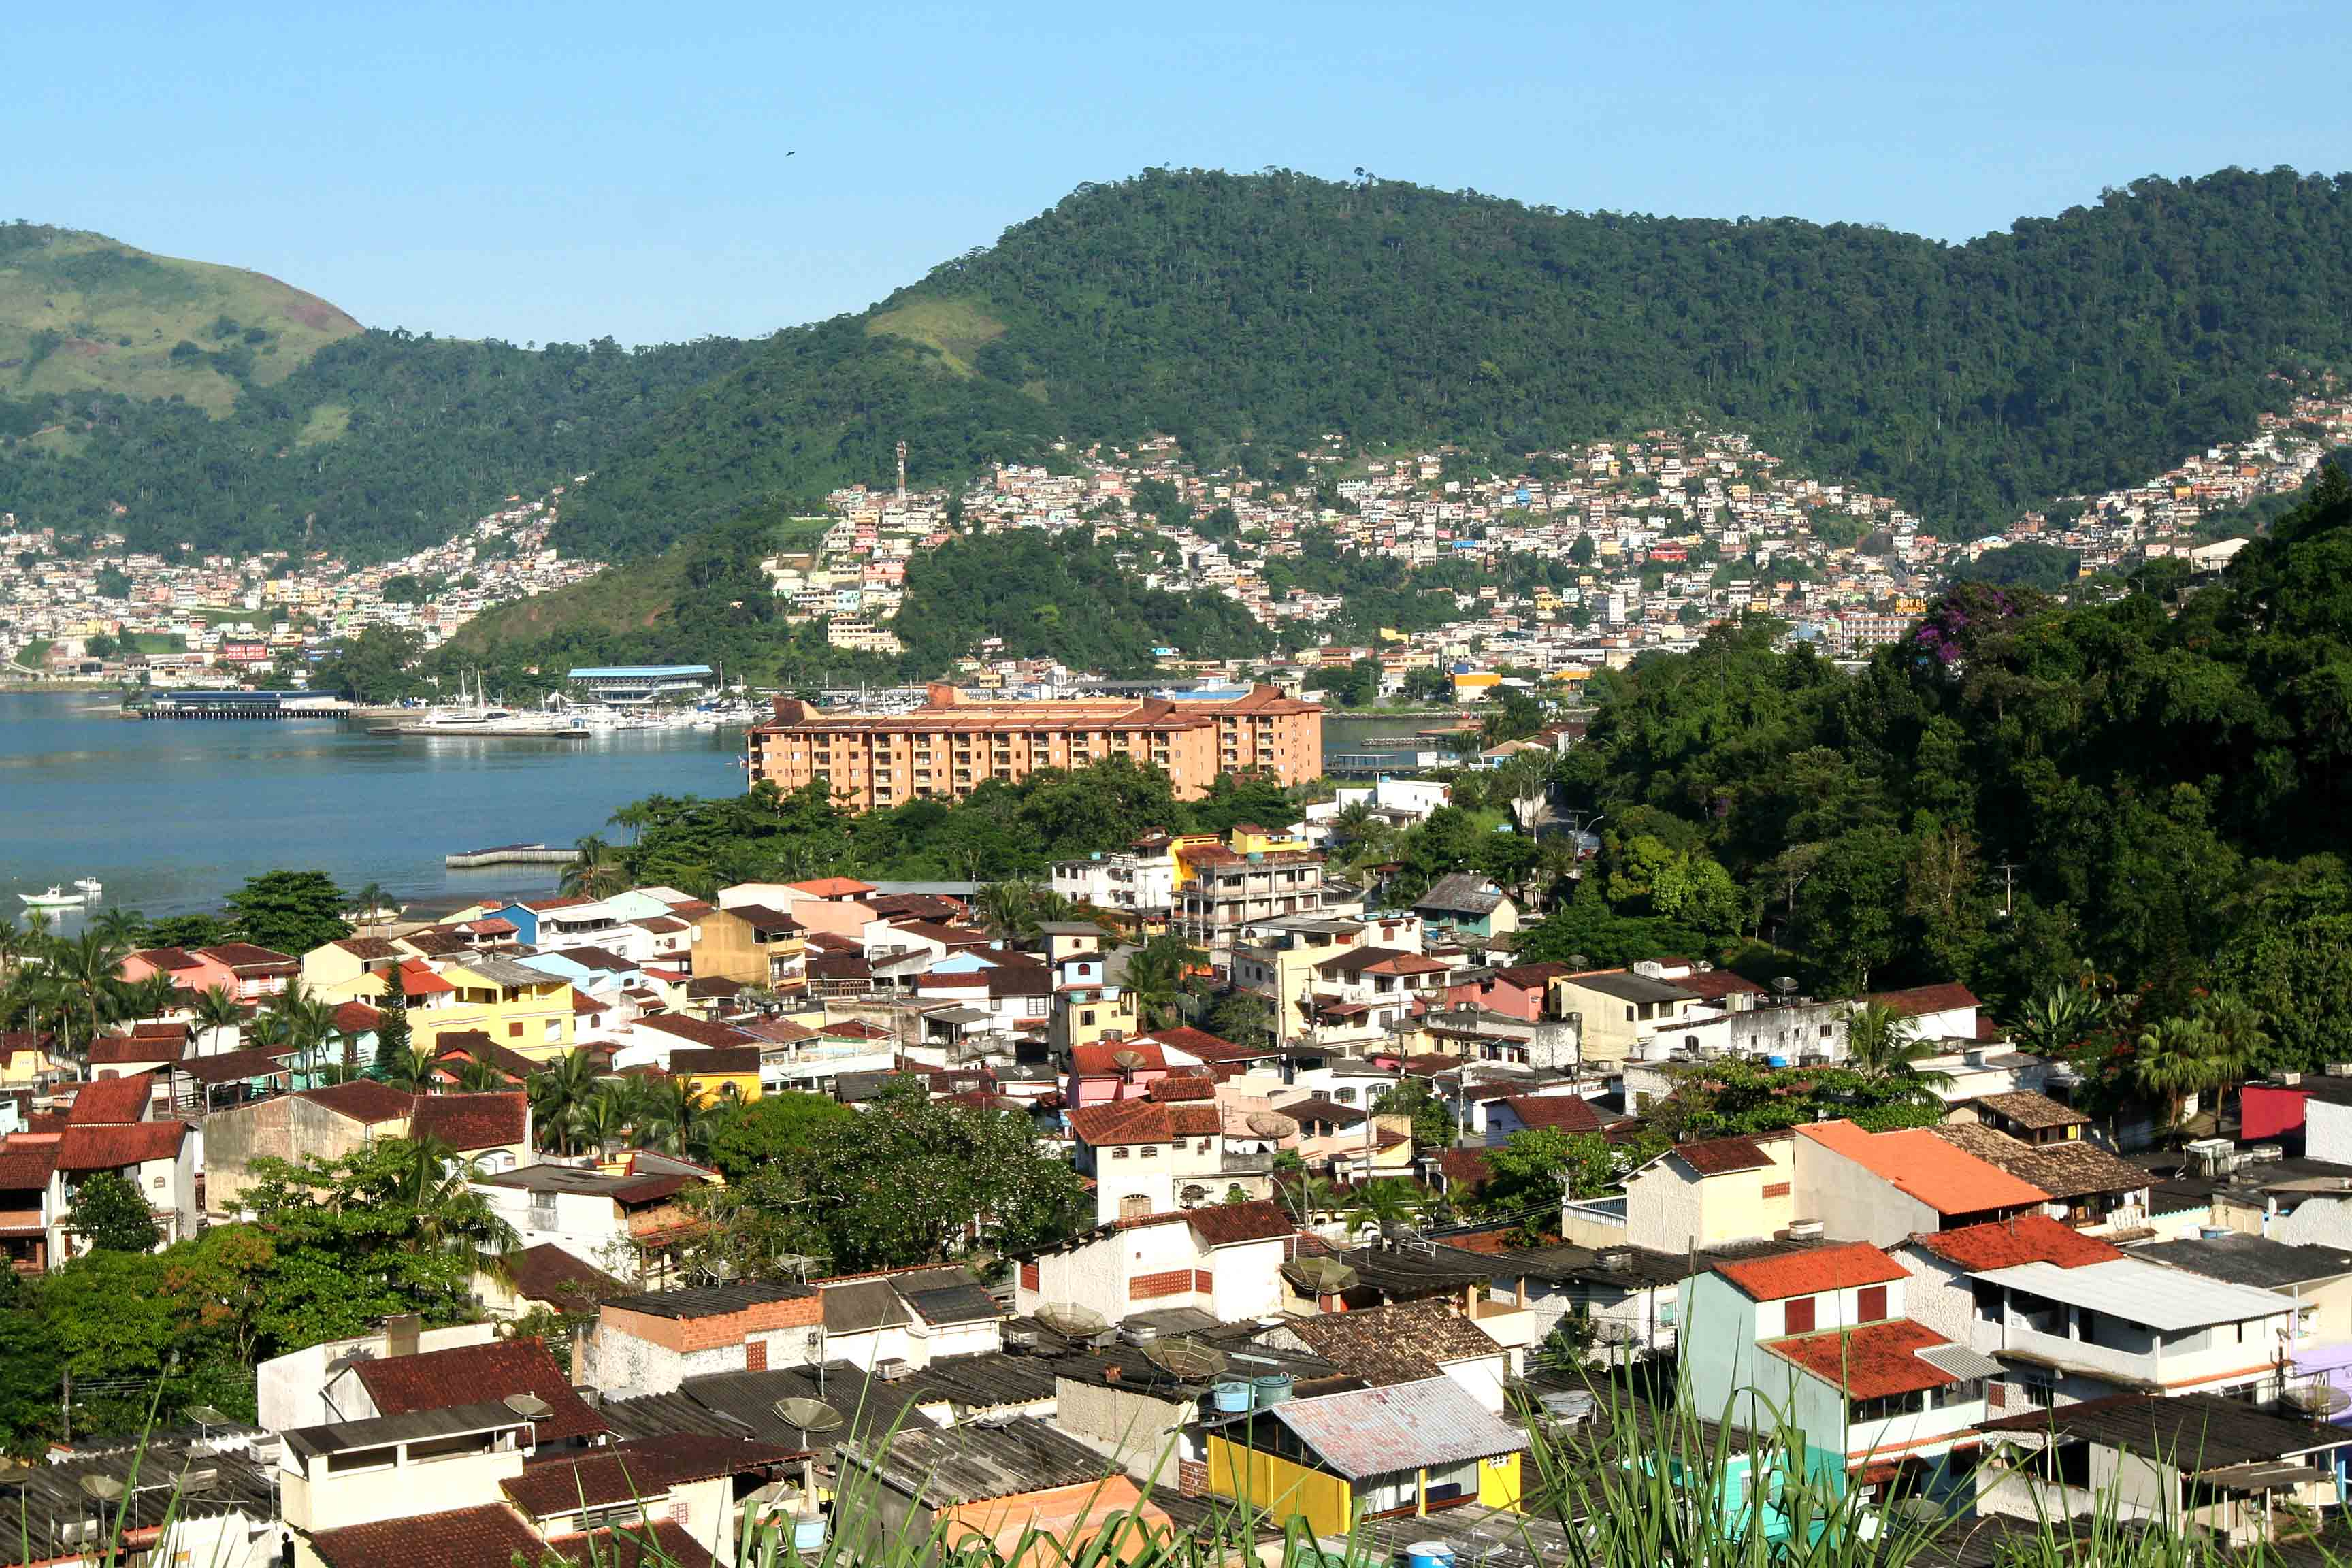 Noleggio Barche Angra Dos Reis - Navalia | Noleggia un Sogno